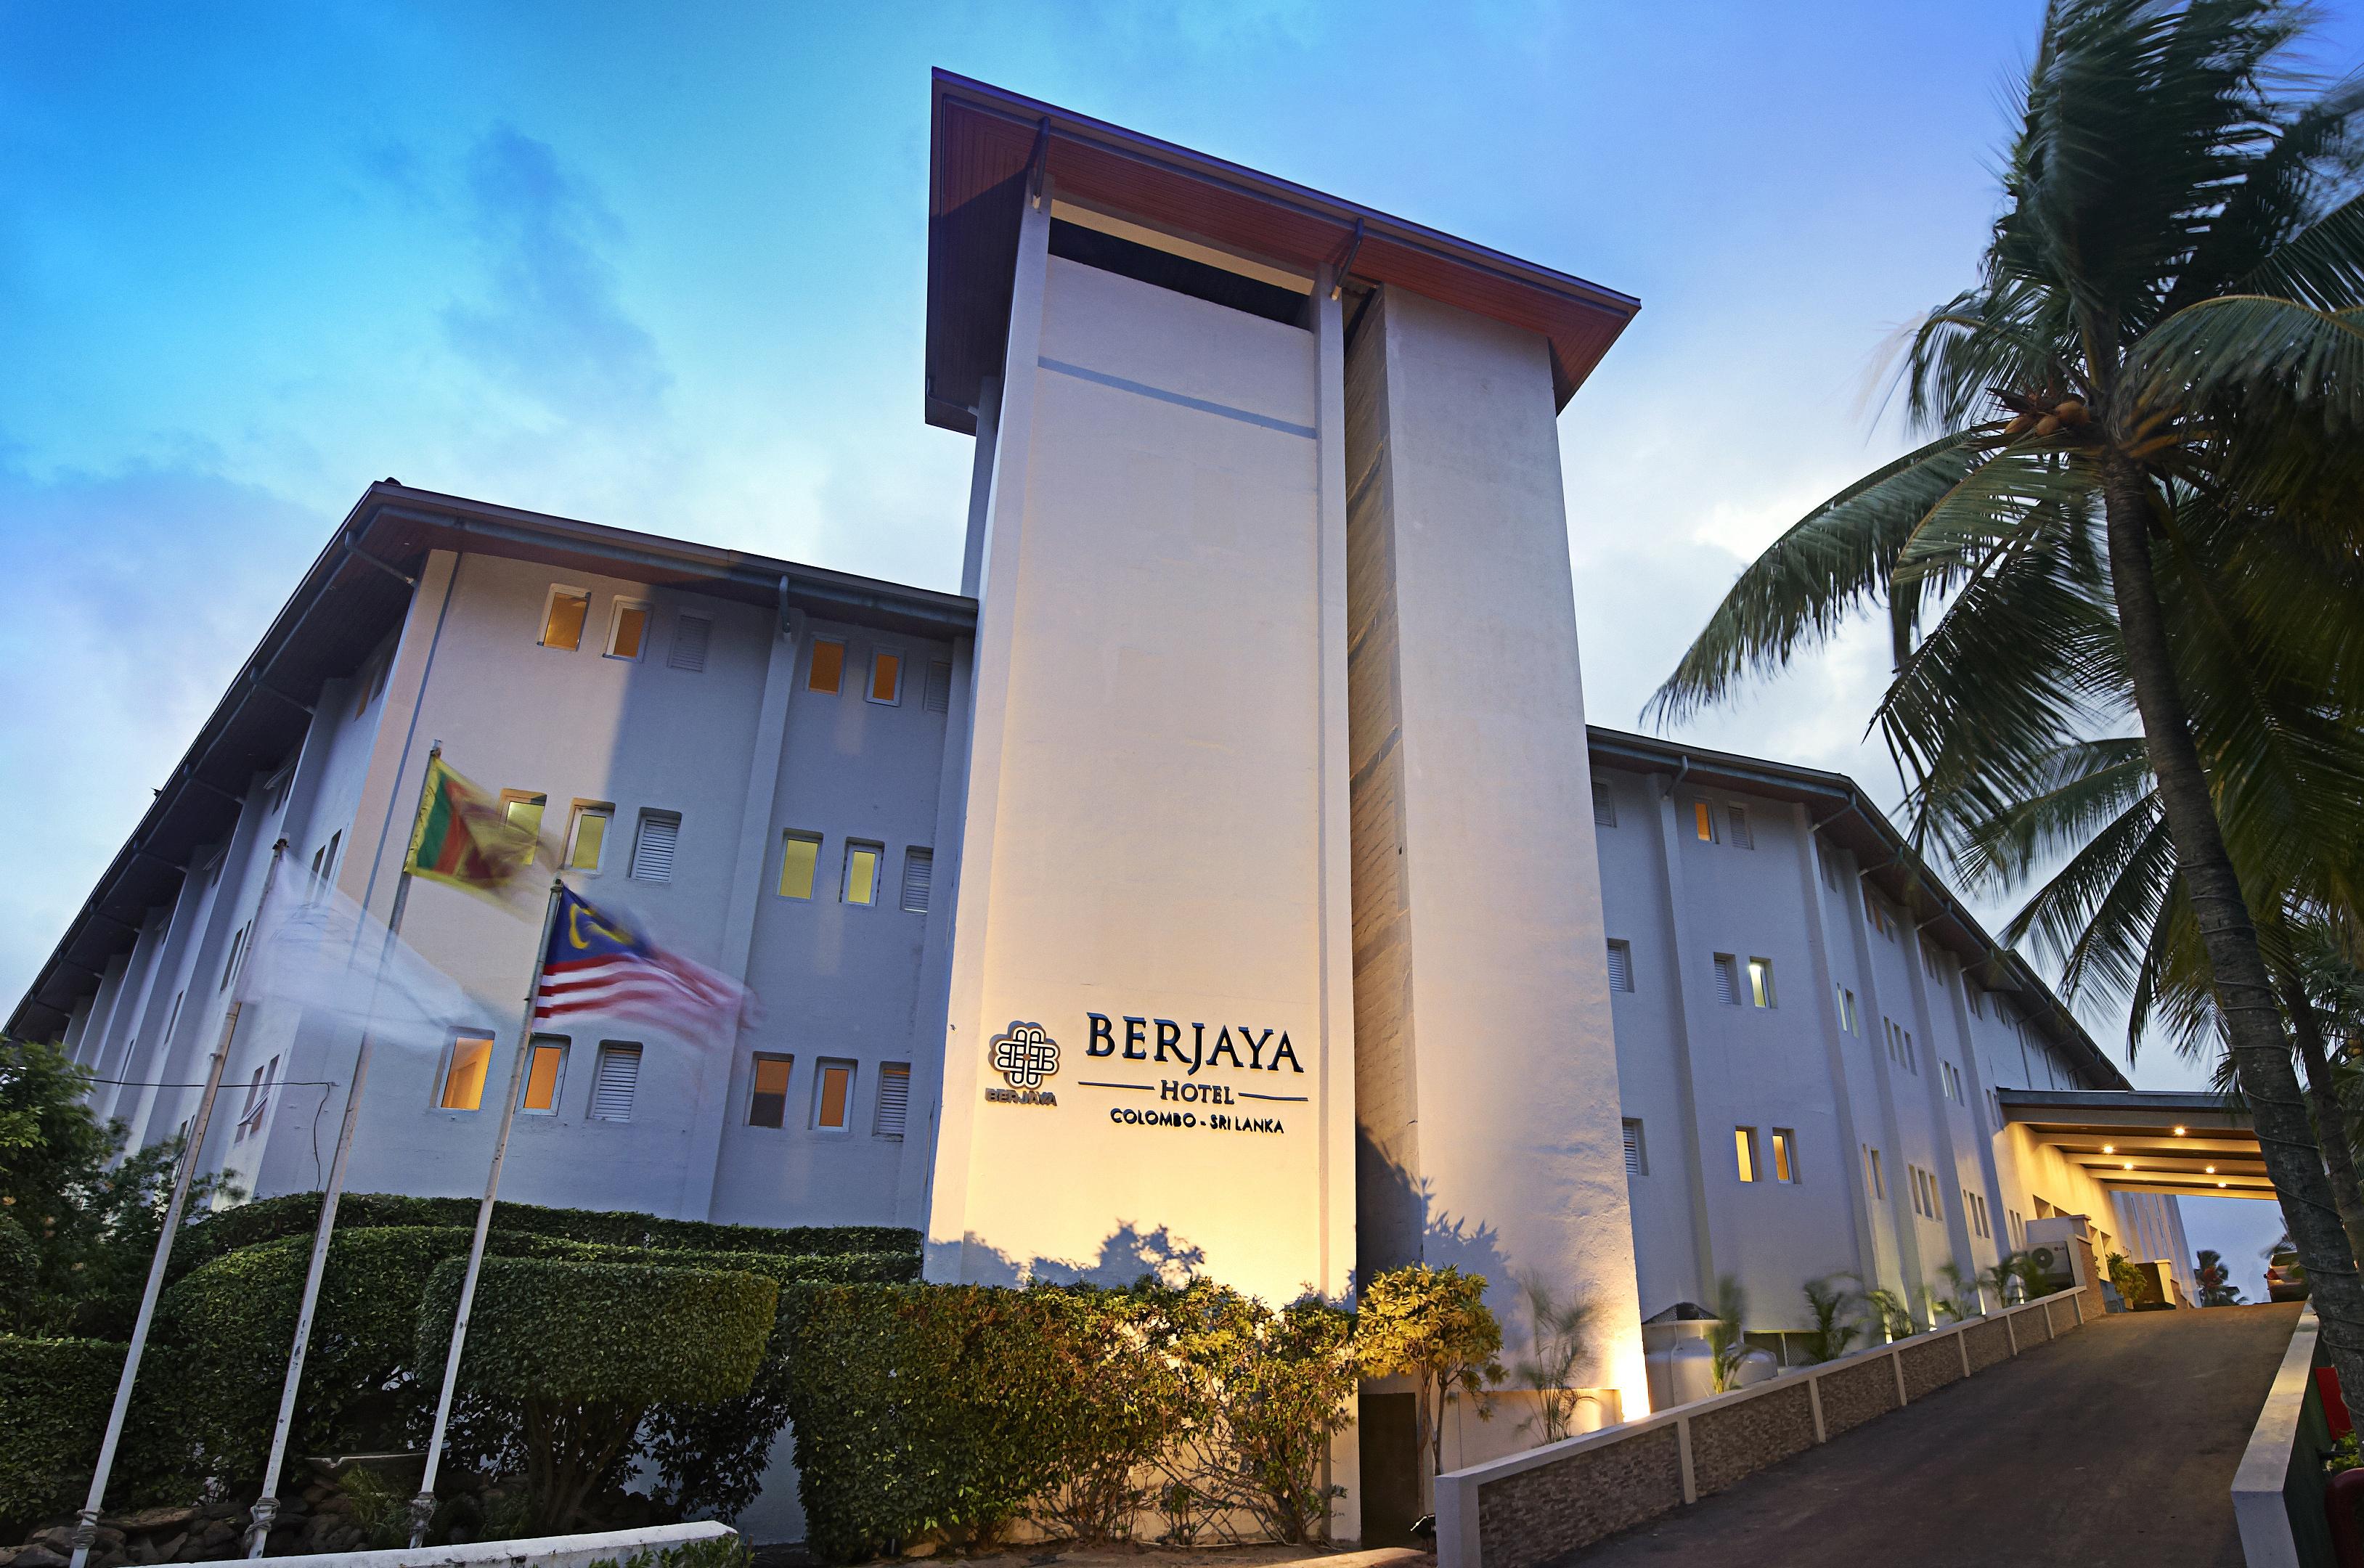 Image from Berjaya Hotel